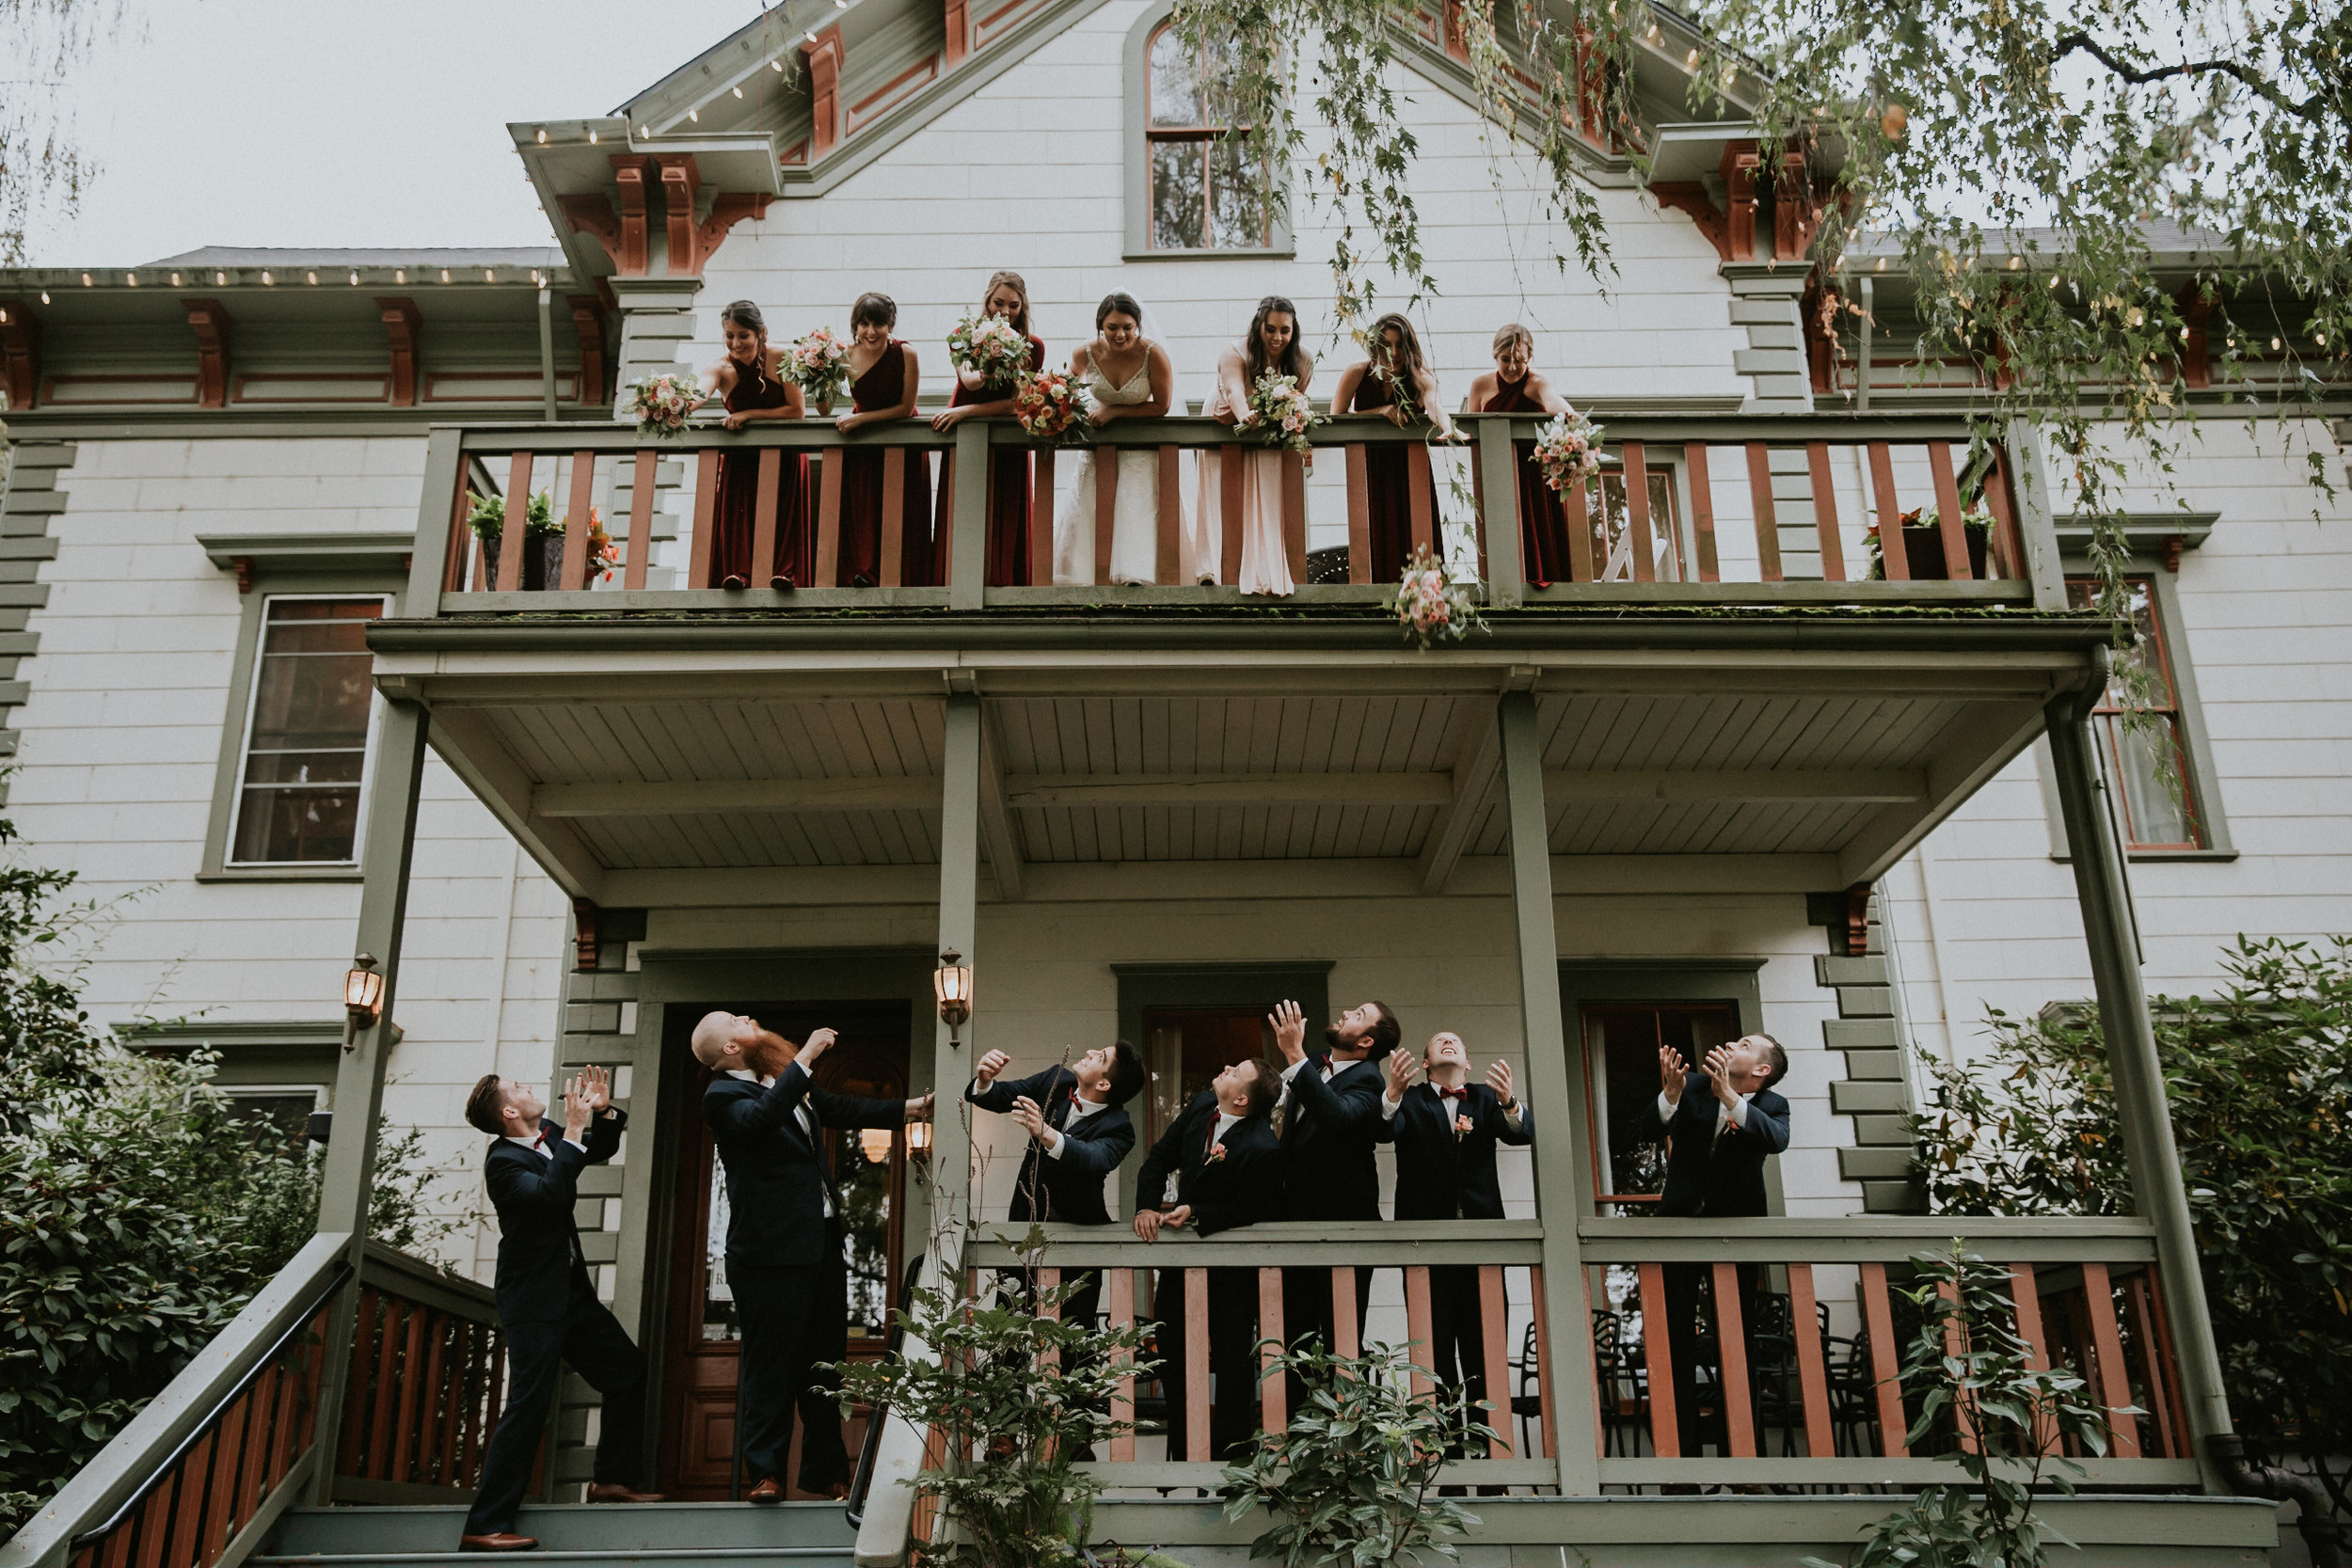 McMenamins_Cornelious_Pass_Roadhouse_wedding_photographer_AlfredTang-4.jpg